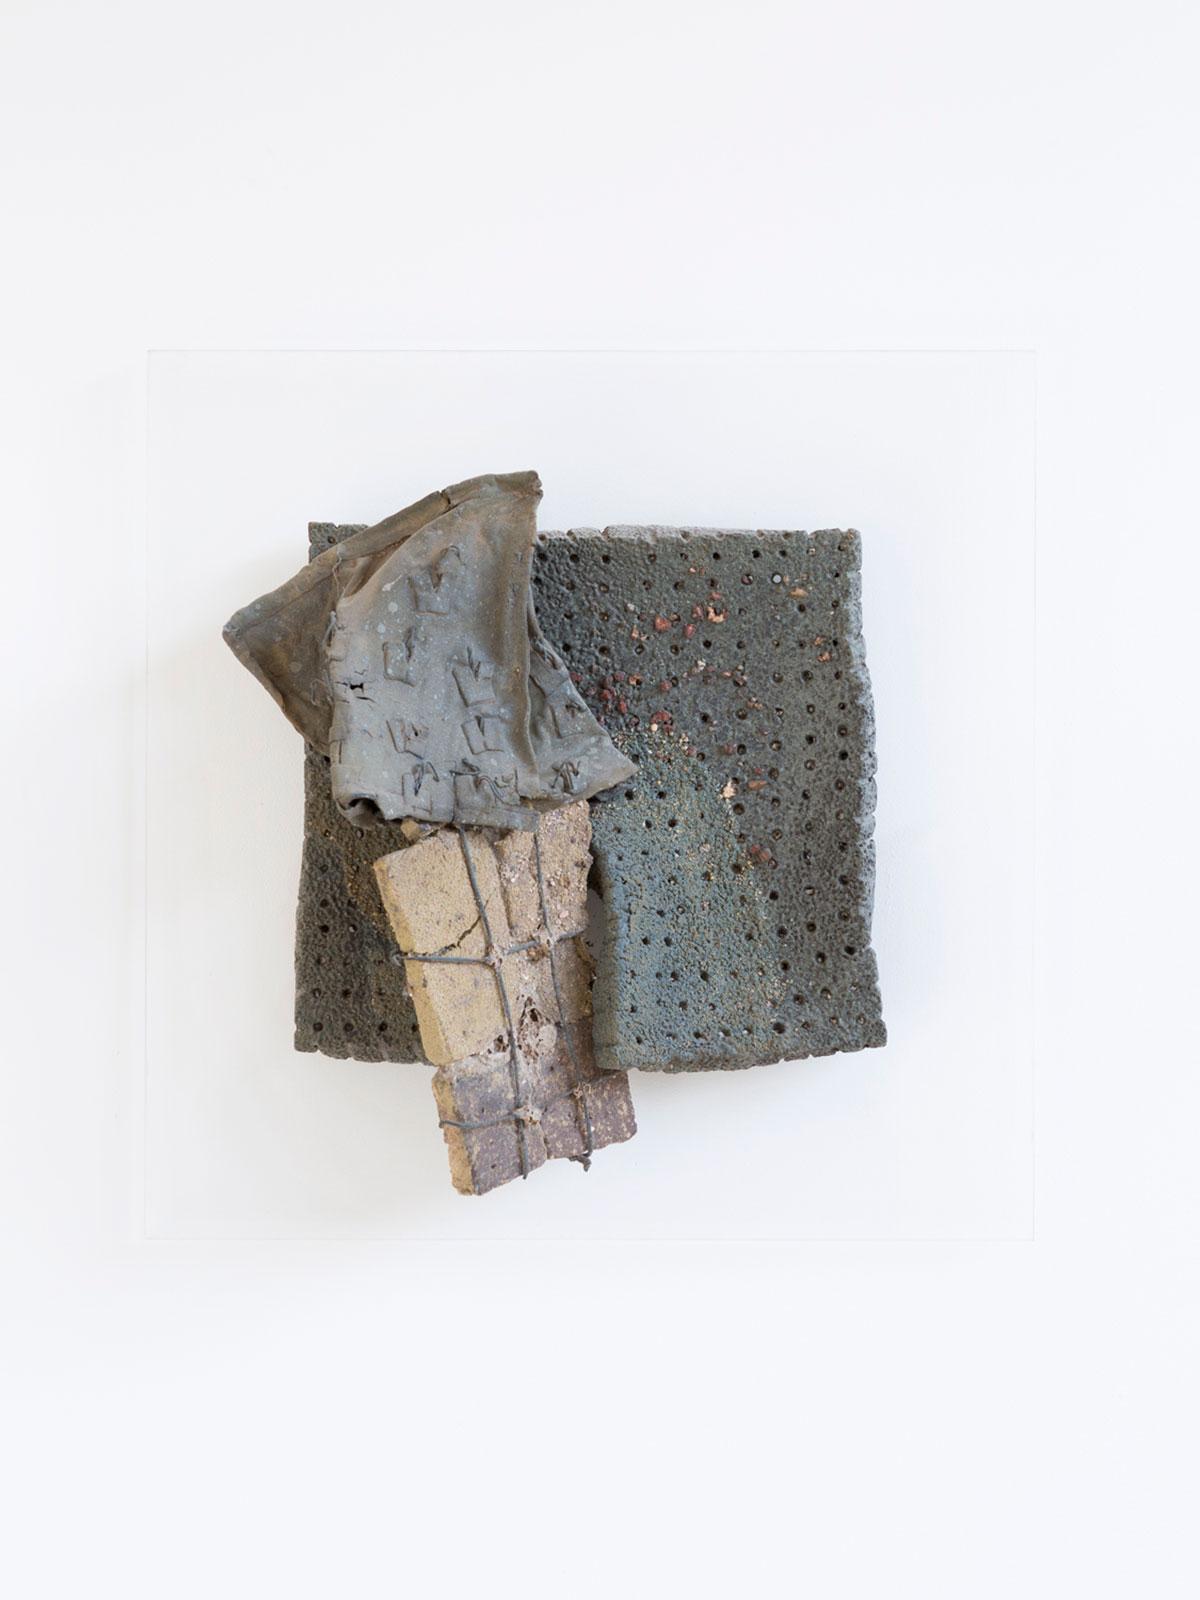 11.-Wall-mounted-Brick-Bag1981-Melted-brick-in-fibreglass-bag-ceramic-wire-46-x-46-x-14-cm - Copy.jpg